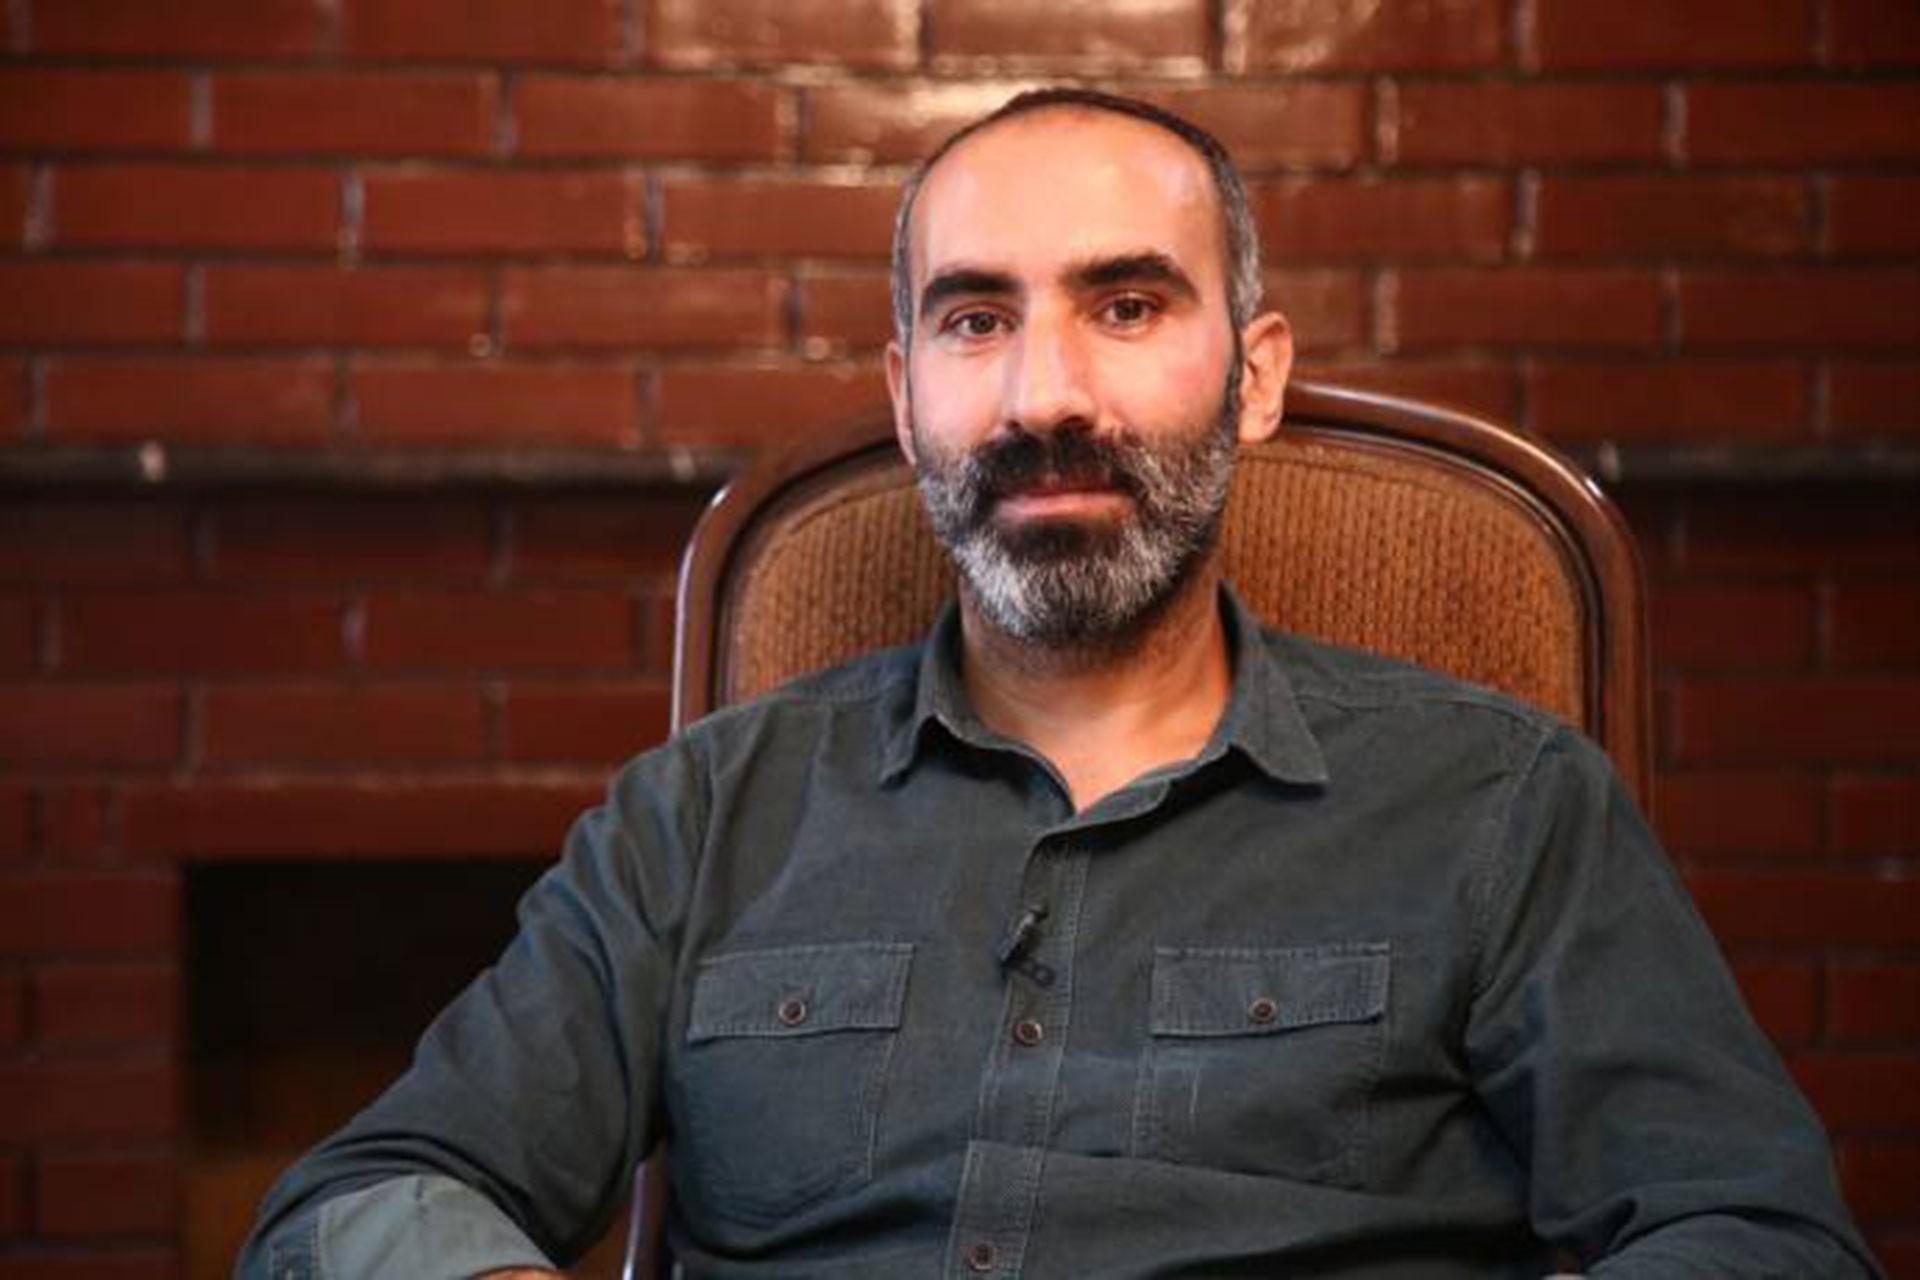 Akit hedef gösterdi, Gazeteci Kenan Kırkaya'ya dava açıldı